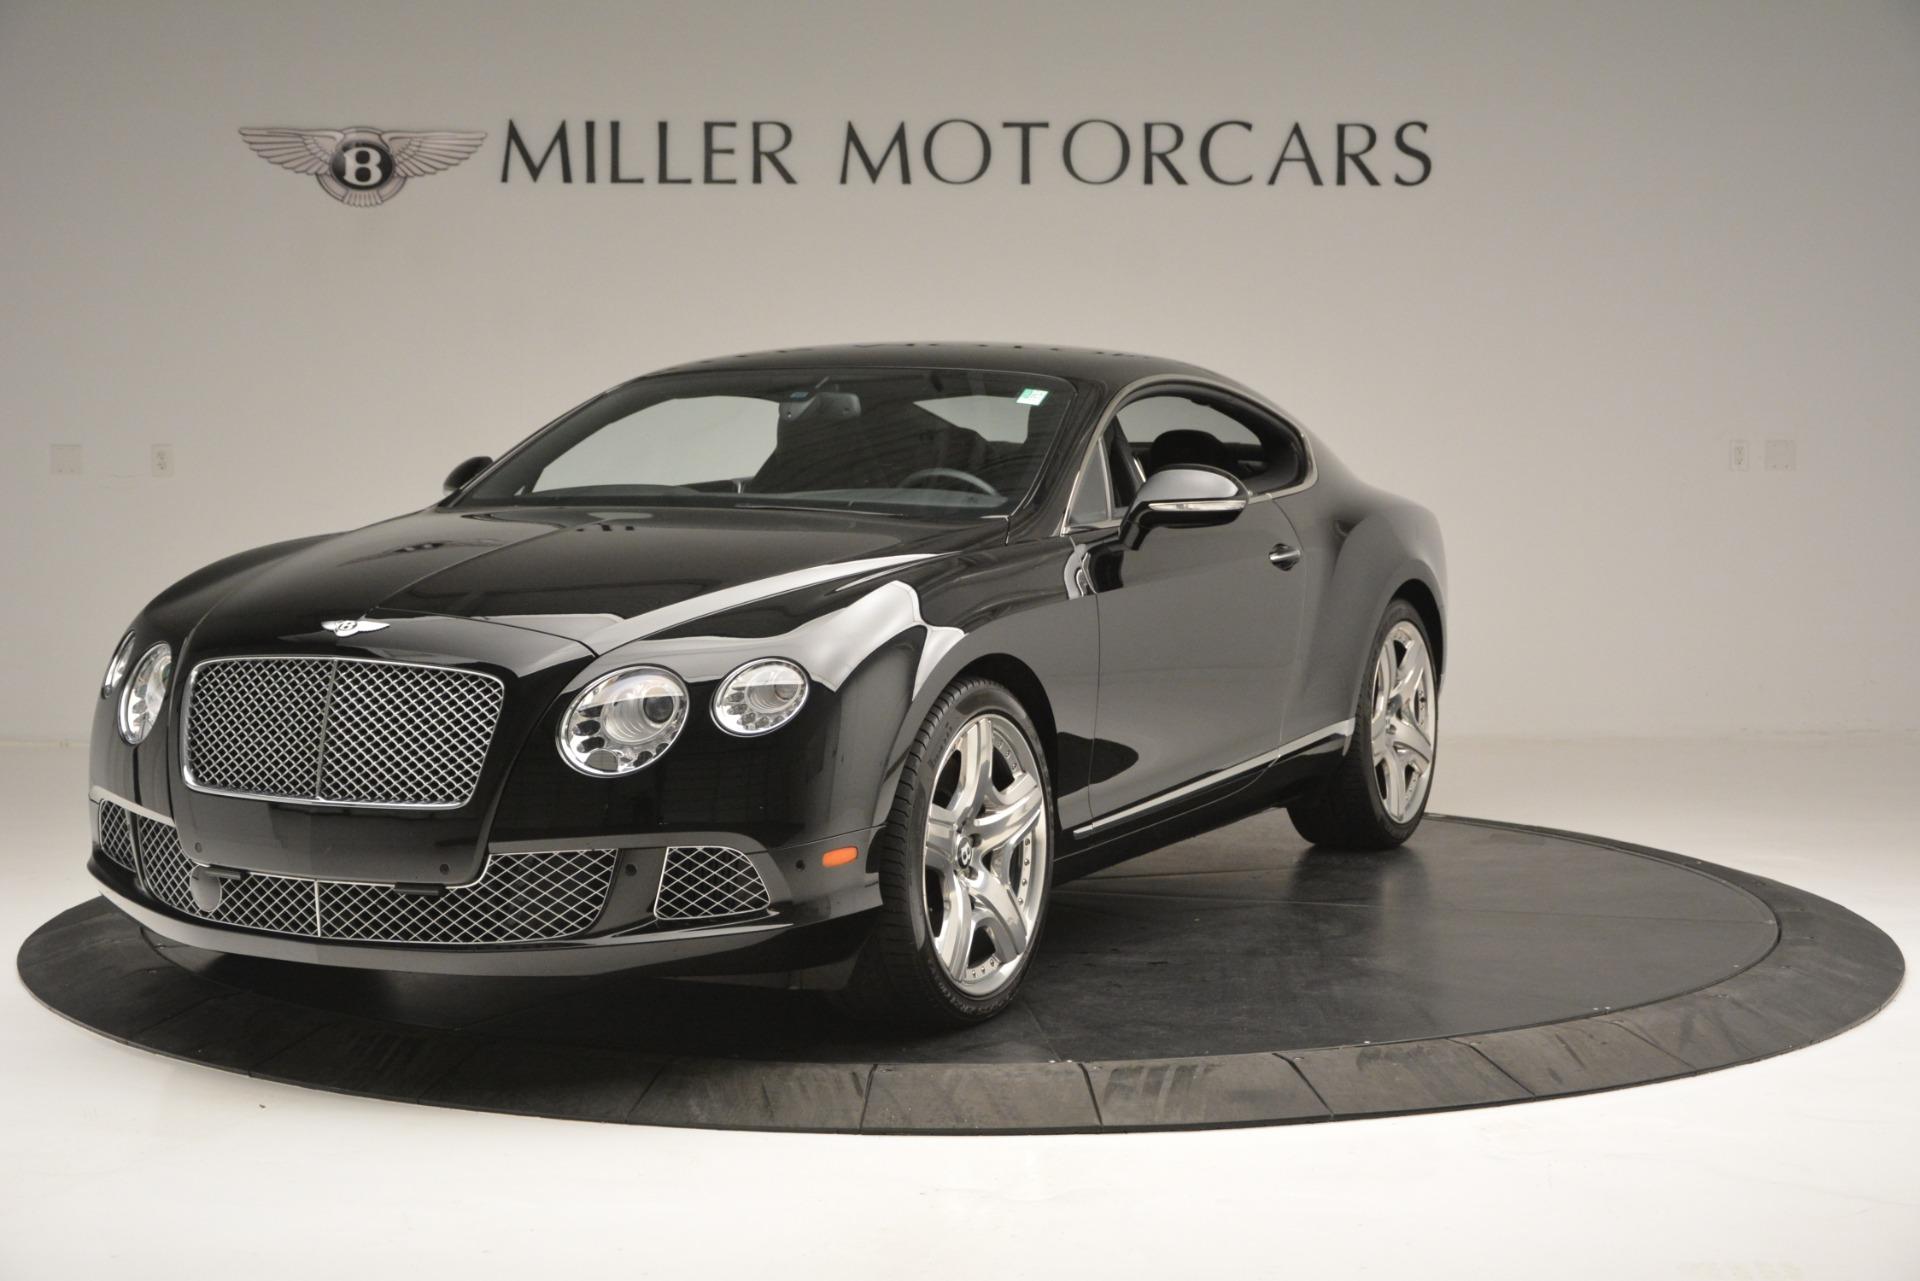 Used 2012 Bentley Continental GT W12 for sale Sold at Alfa Romeo of Westport in Westport CT 06880 1